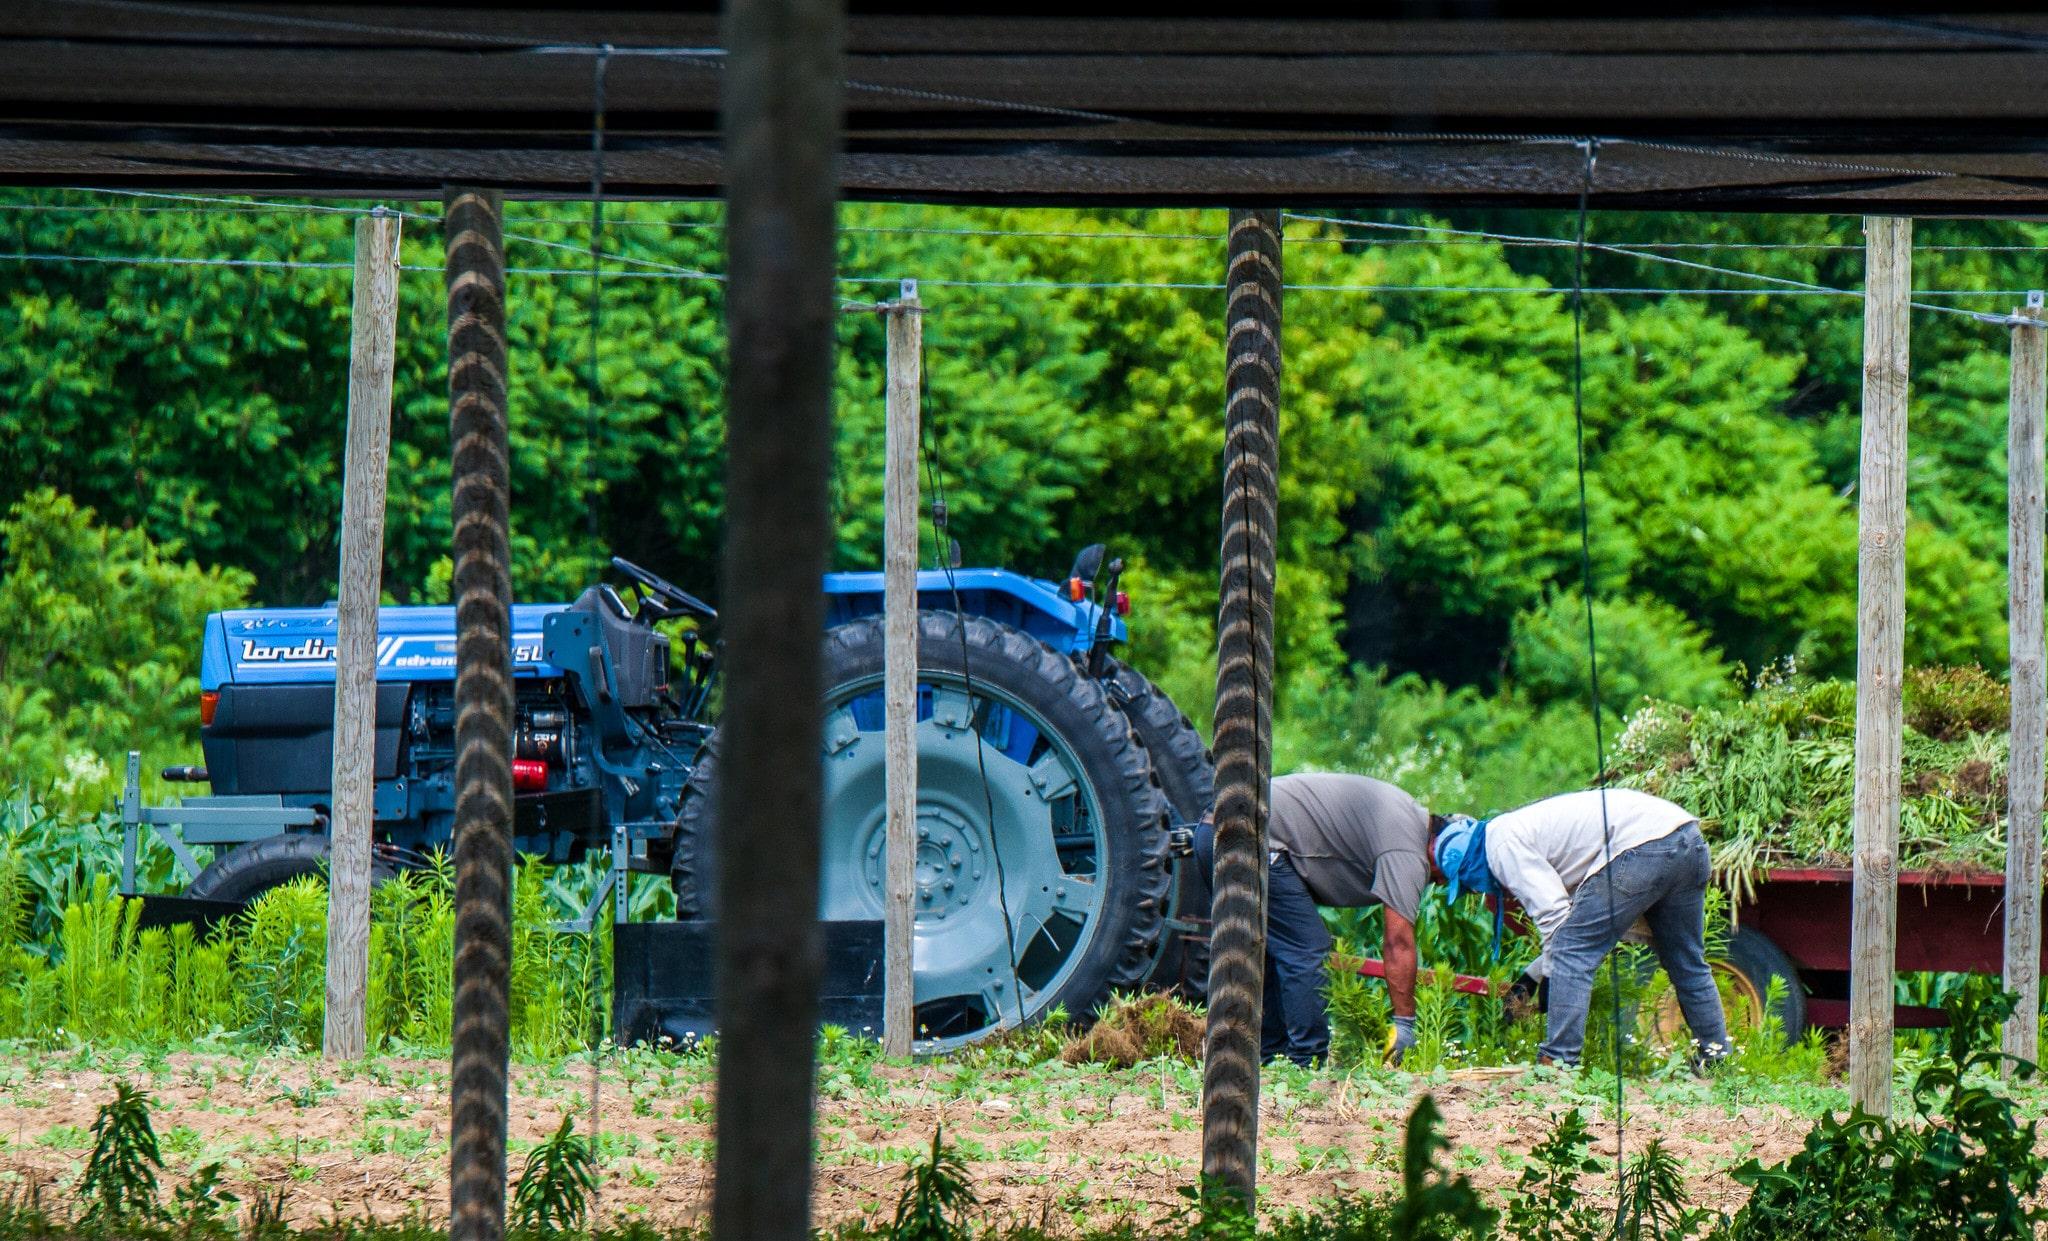 | Migrant farm labourers at work in Vittoria Ontario | MR Online